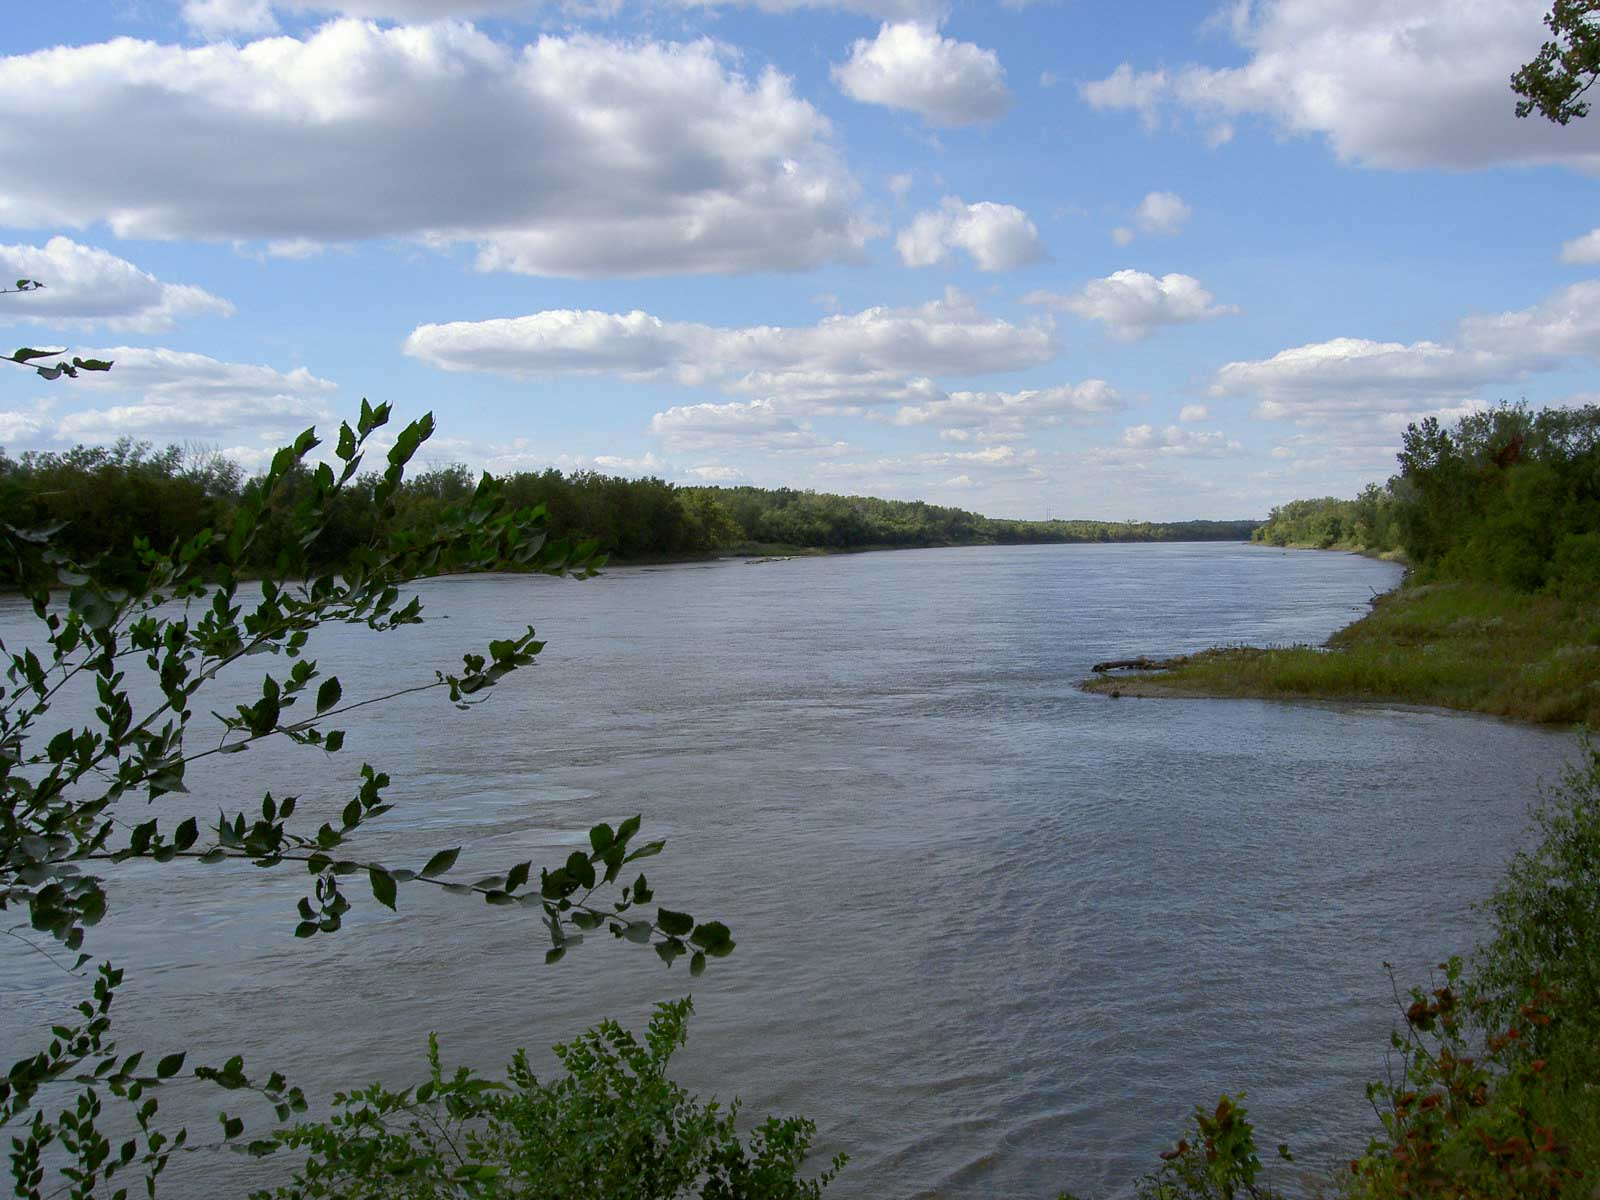 The Missouri River at St. Joseph